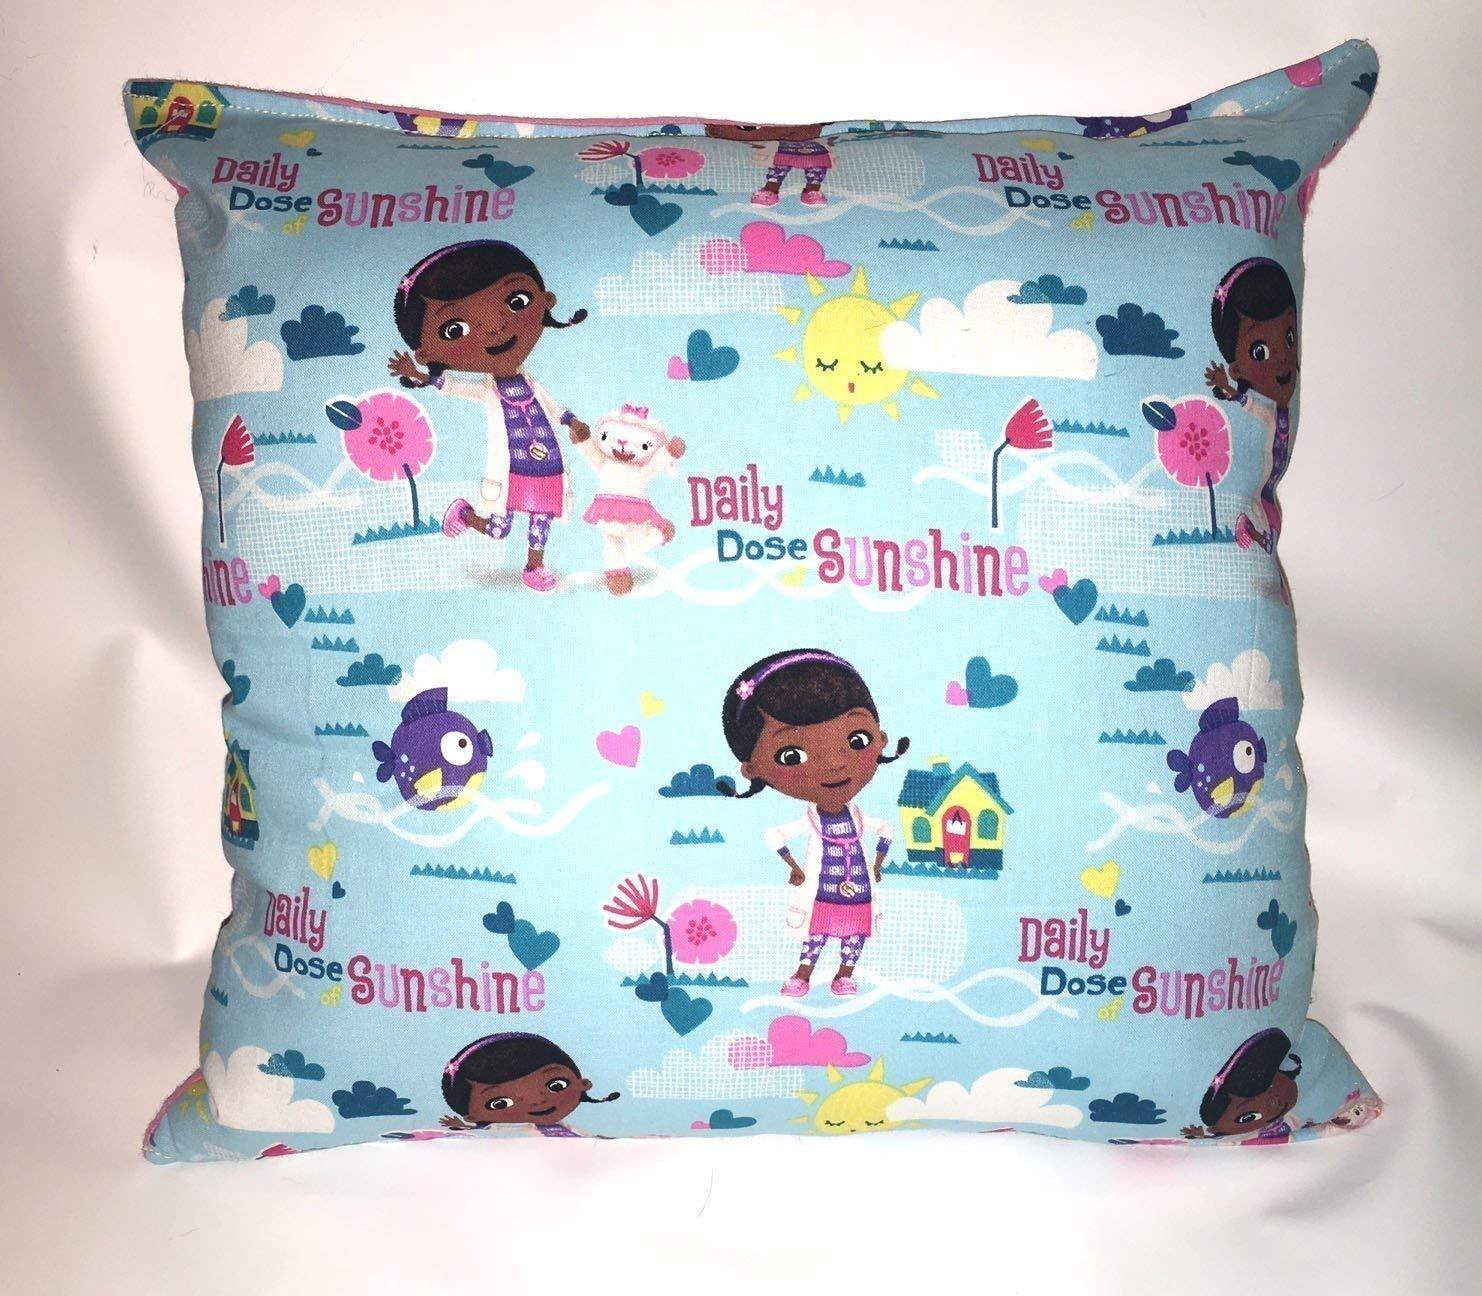 Doc McStuffins Pillow and Fleece Throw Blanket New